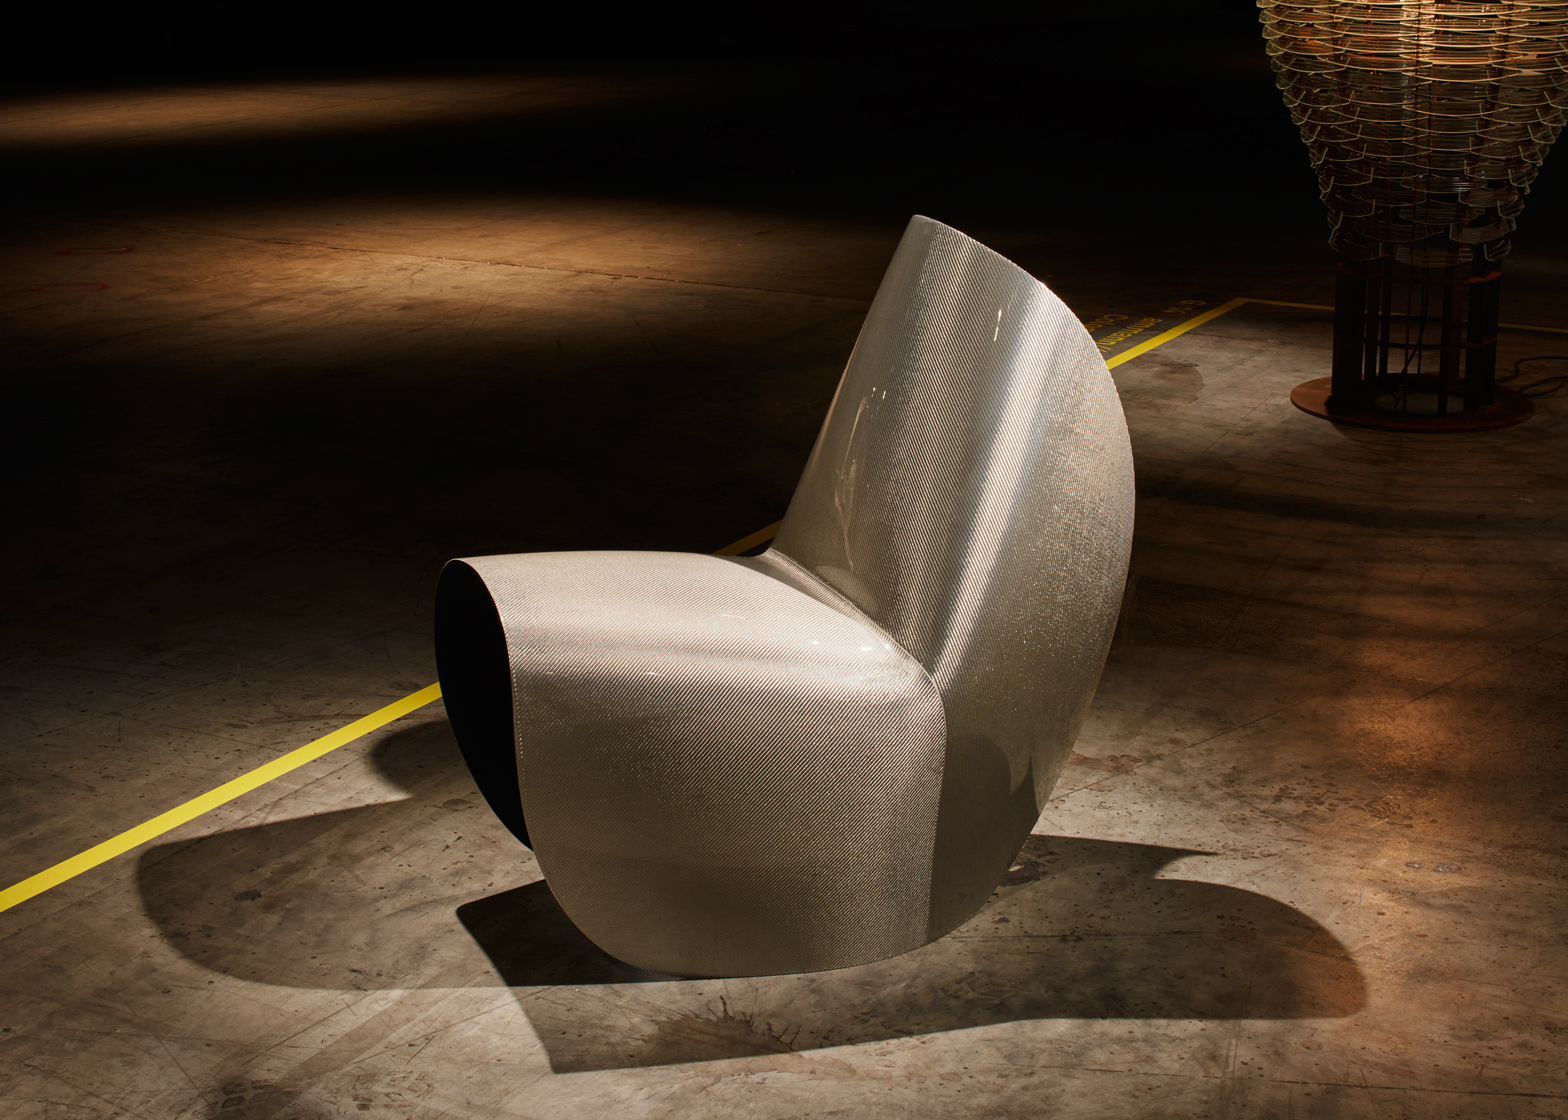 Zaha Hadid Kuki chair for Hypetex